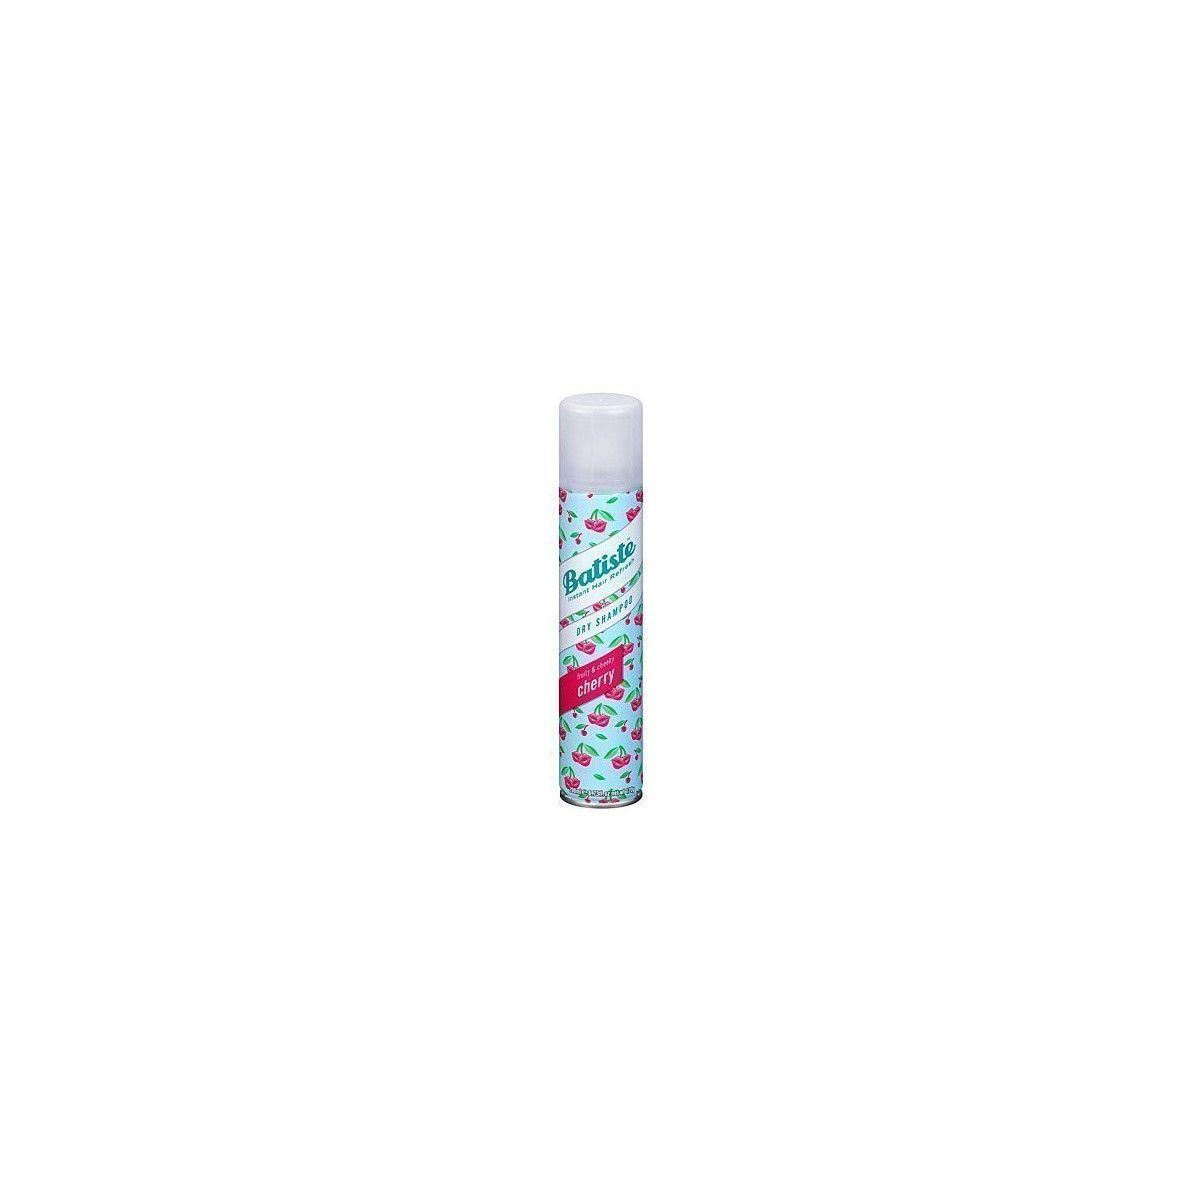 Batiste Cherry Dry, suchy szampon o wiśniowym zapachu, pochłania sebum 200ml